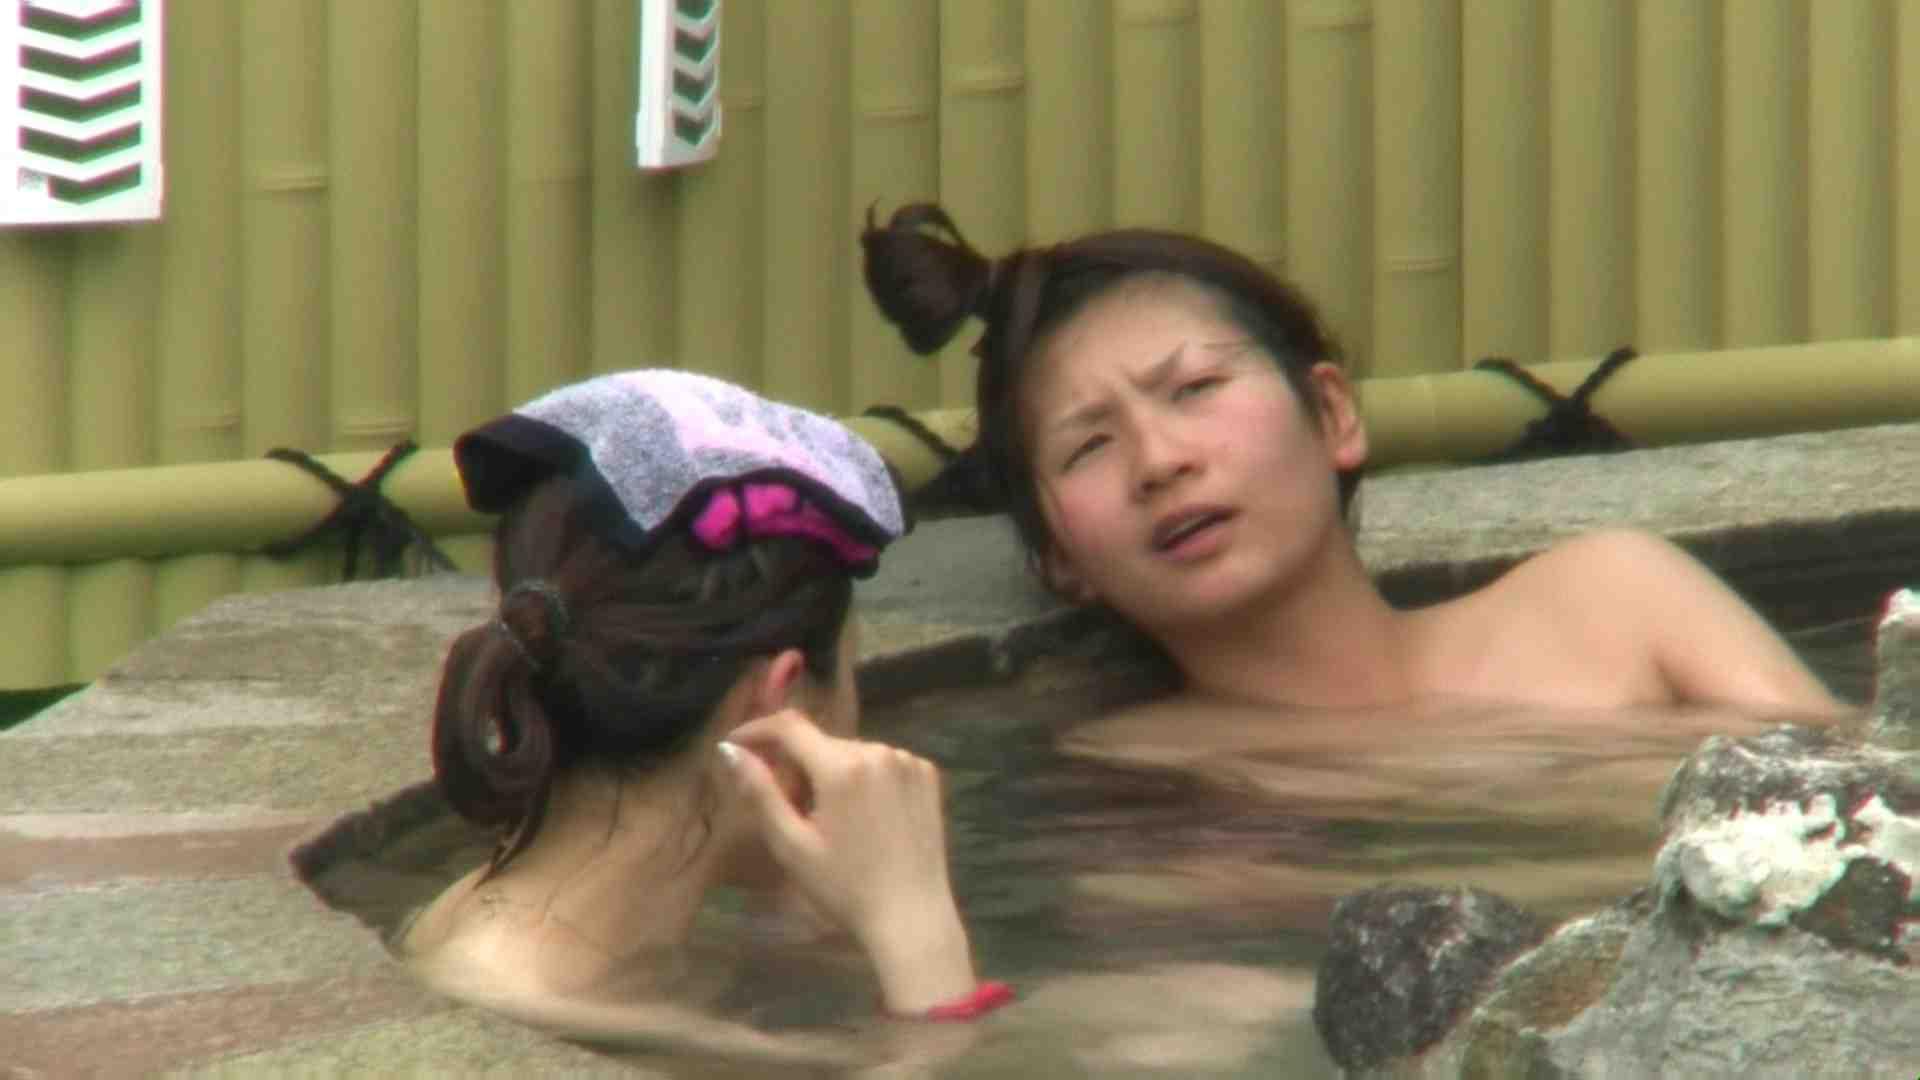 Aquaな露天風呂Vol.66【VIP限定】 OLエロ画像 覗きオメコ動画キャプチャ 74PICs 44